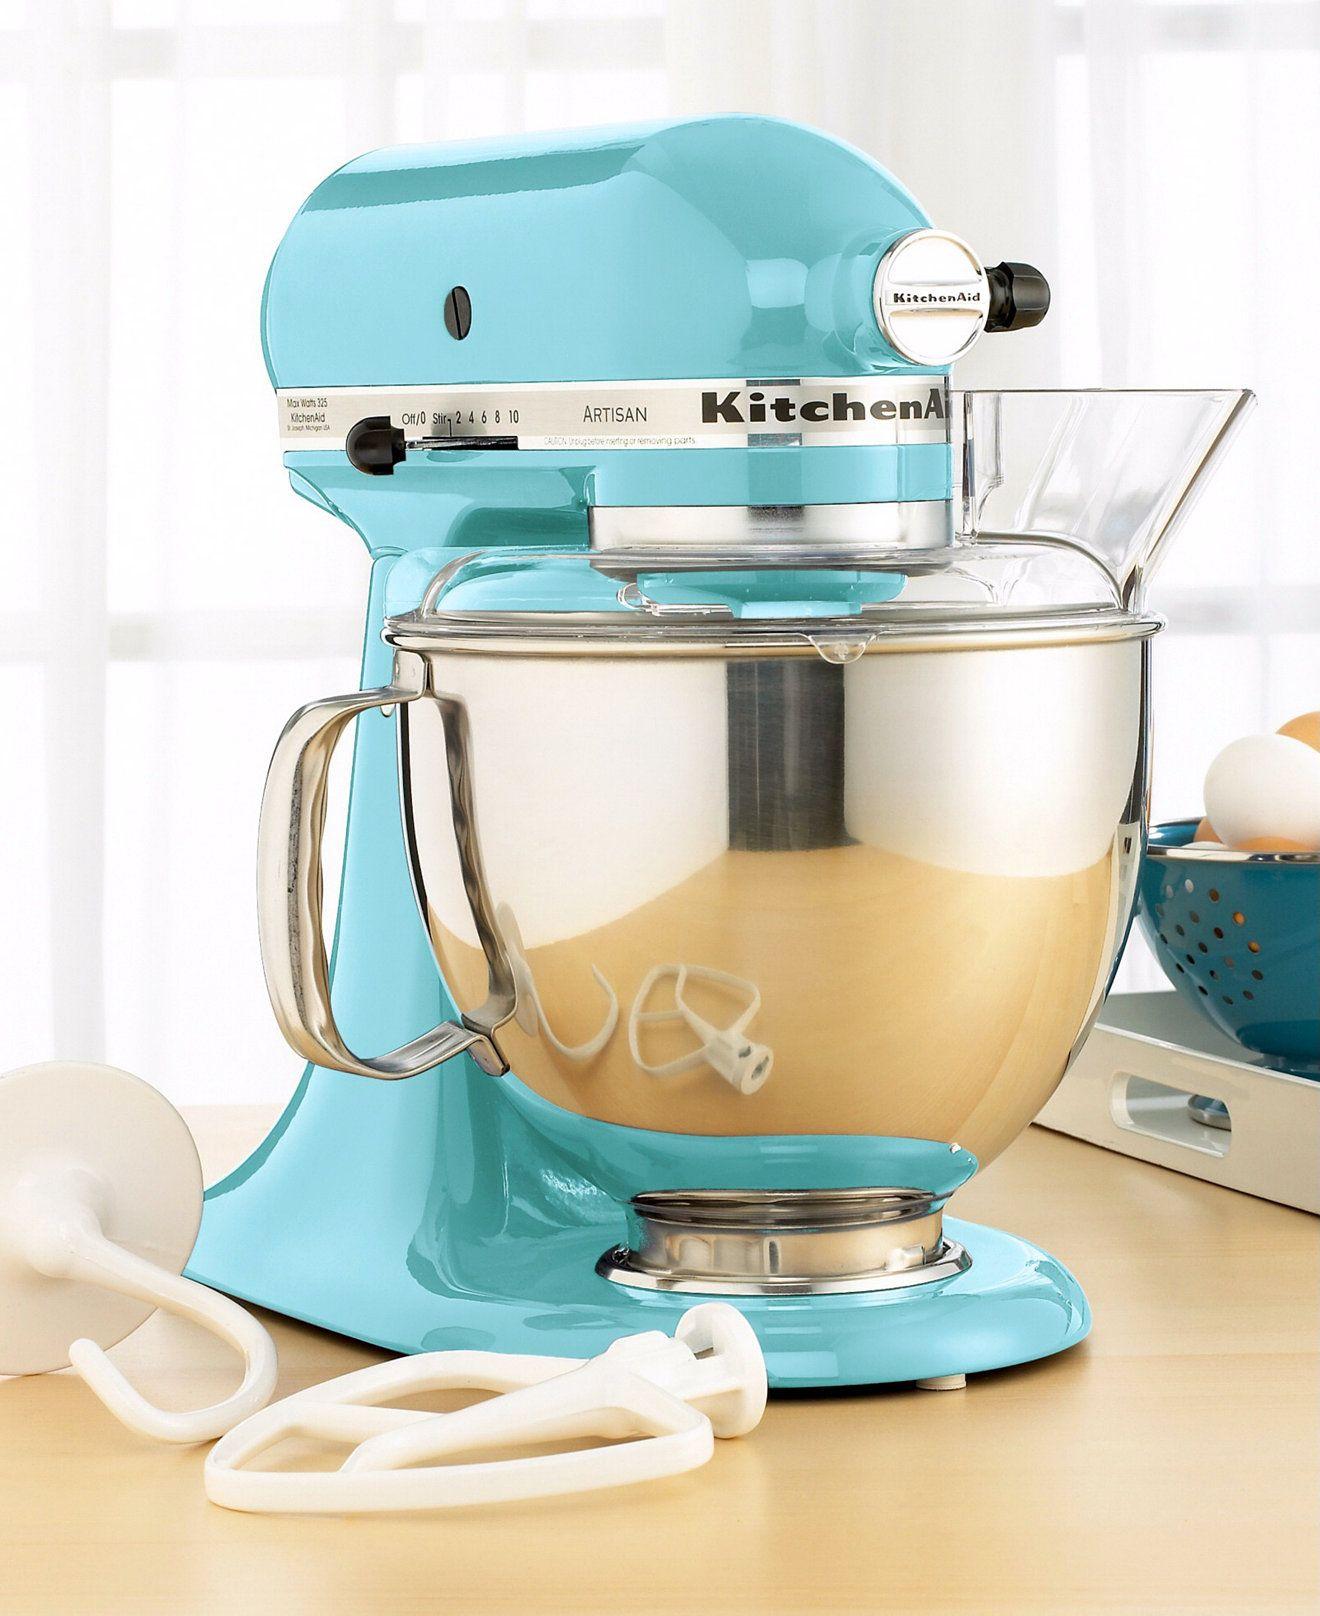 Kitchenaid artisan 5 qt stand mixer in aqua sky